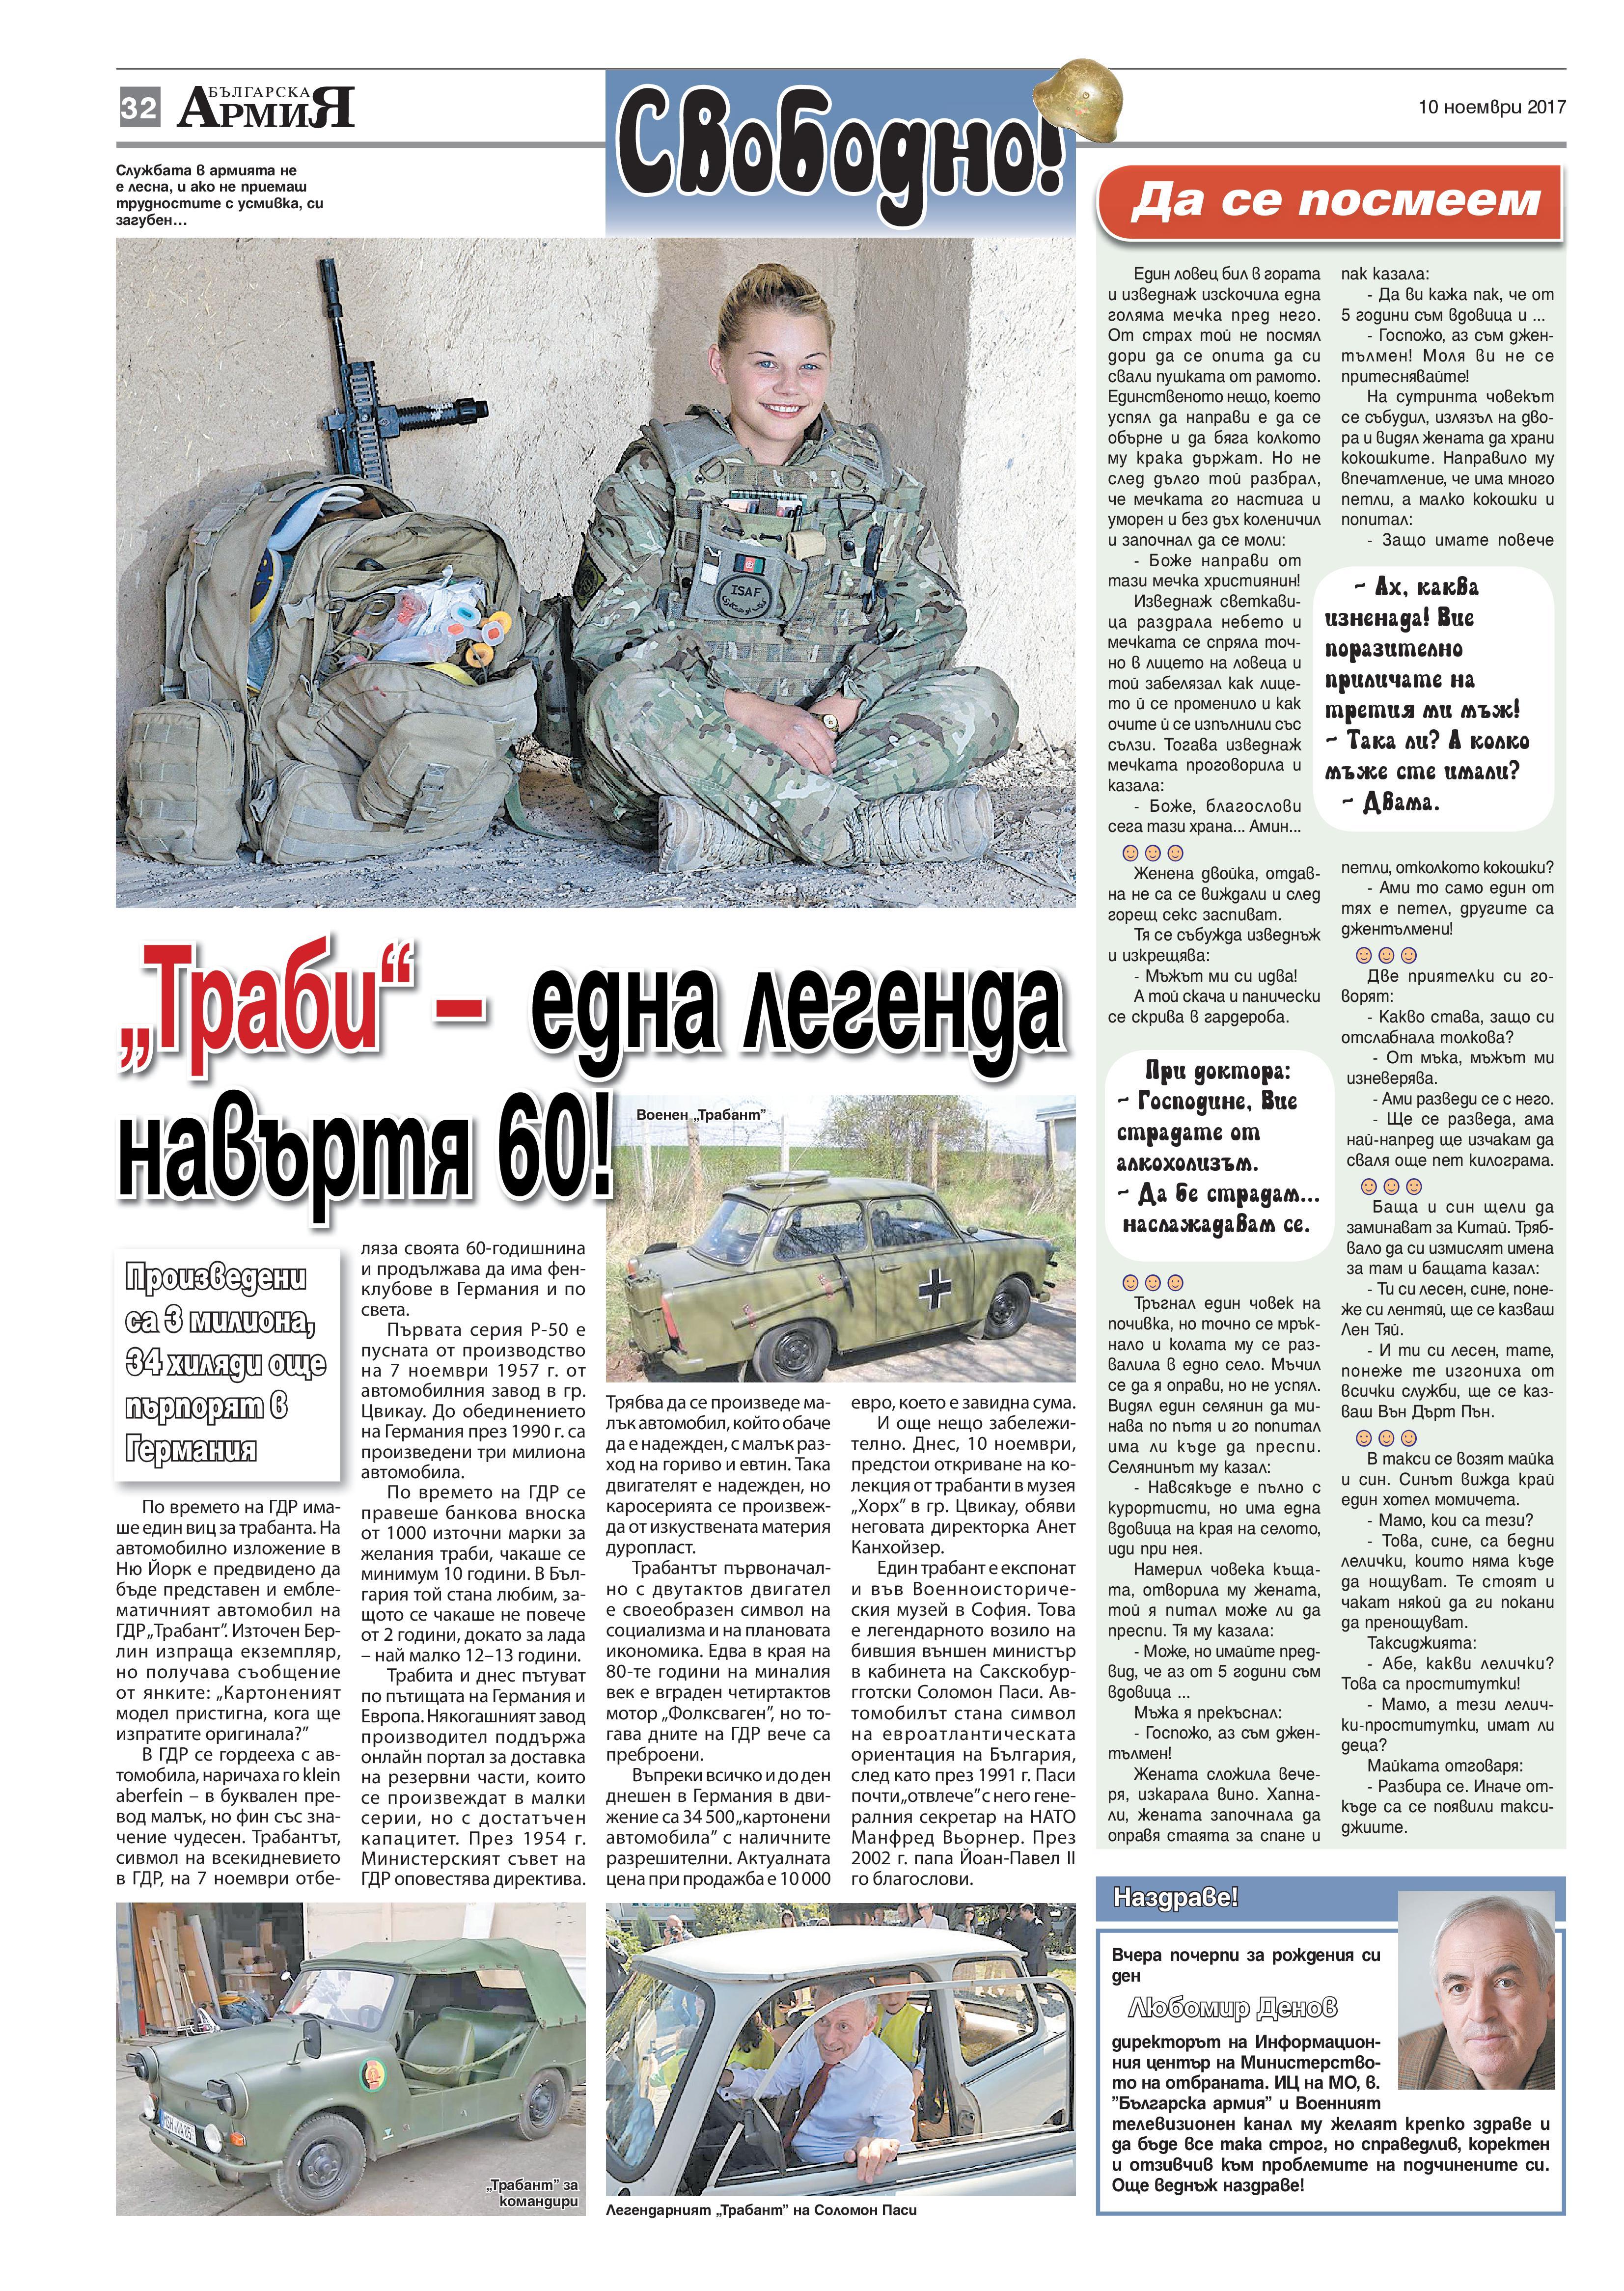 http://armymedia.bg/wp-content/uploads/2015/06/32-11.jpg